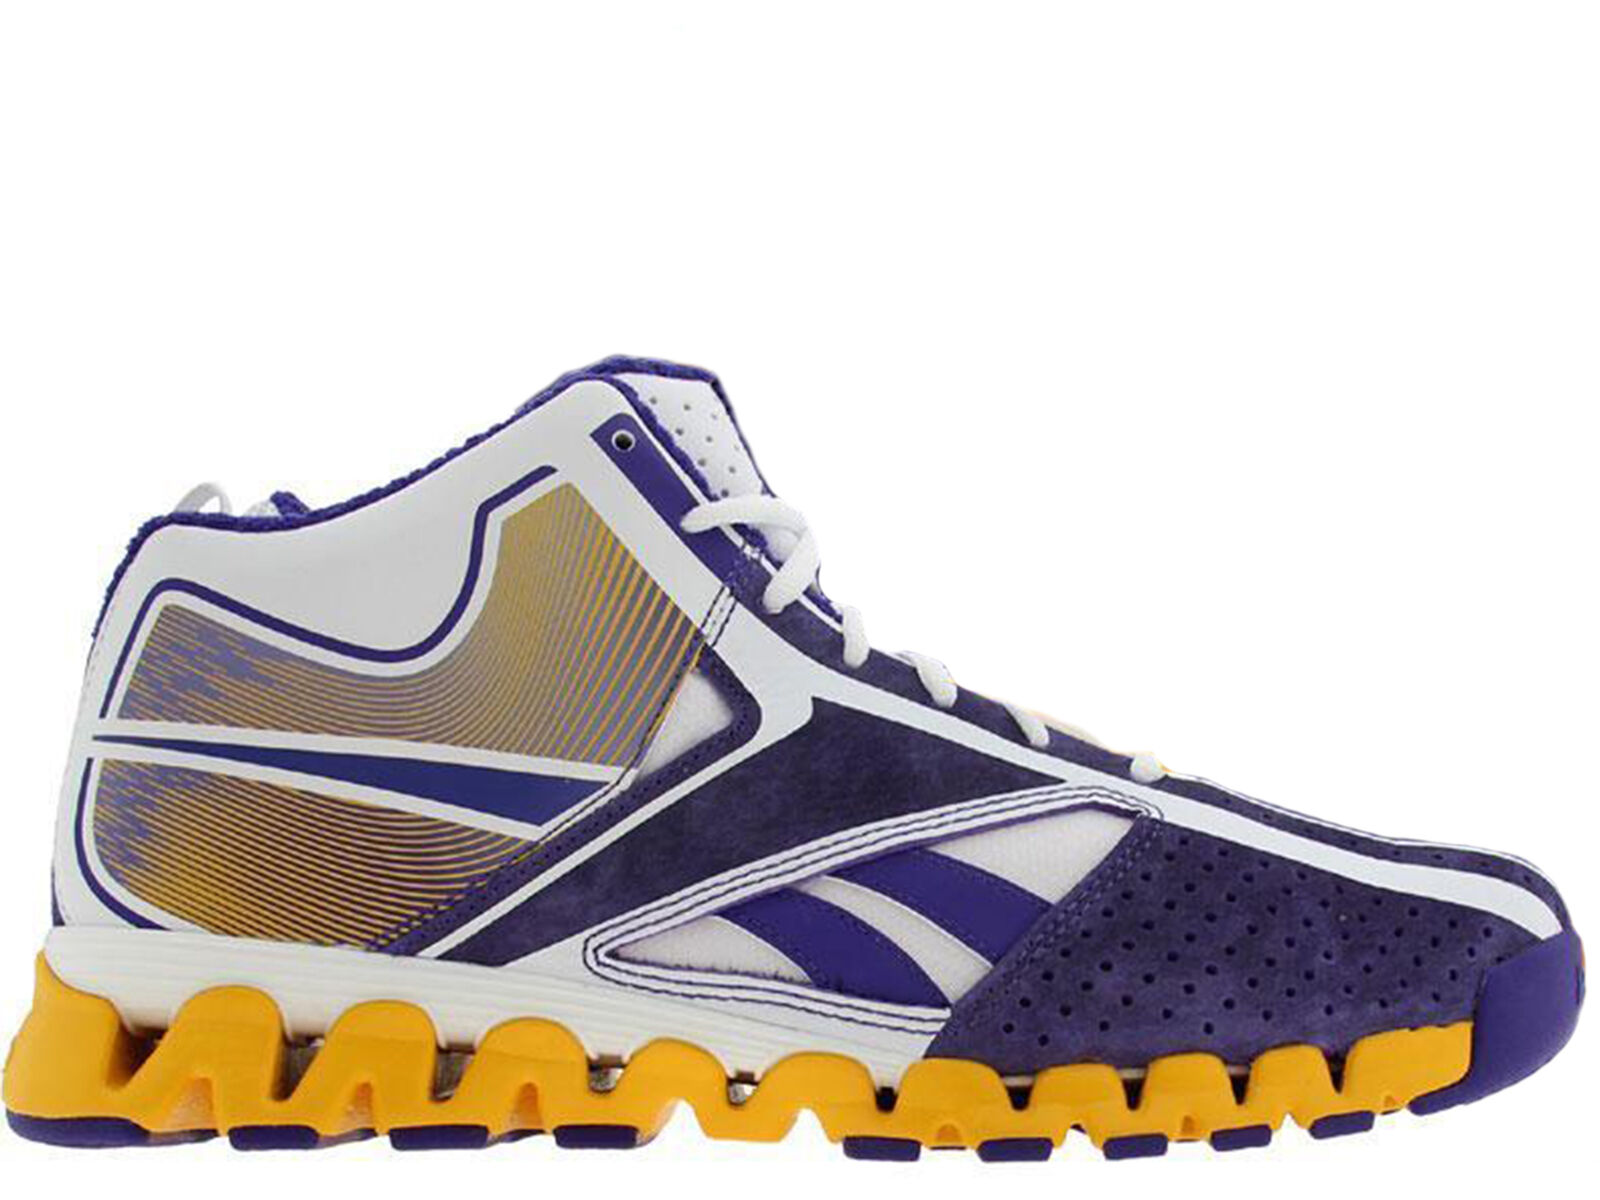 Brand New Reebok Zignano Wall Season 2 Men's Athletic Fashion Sneakers [J87639]